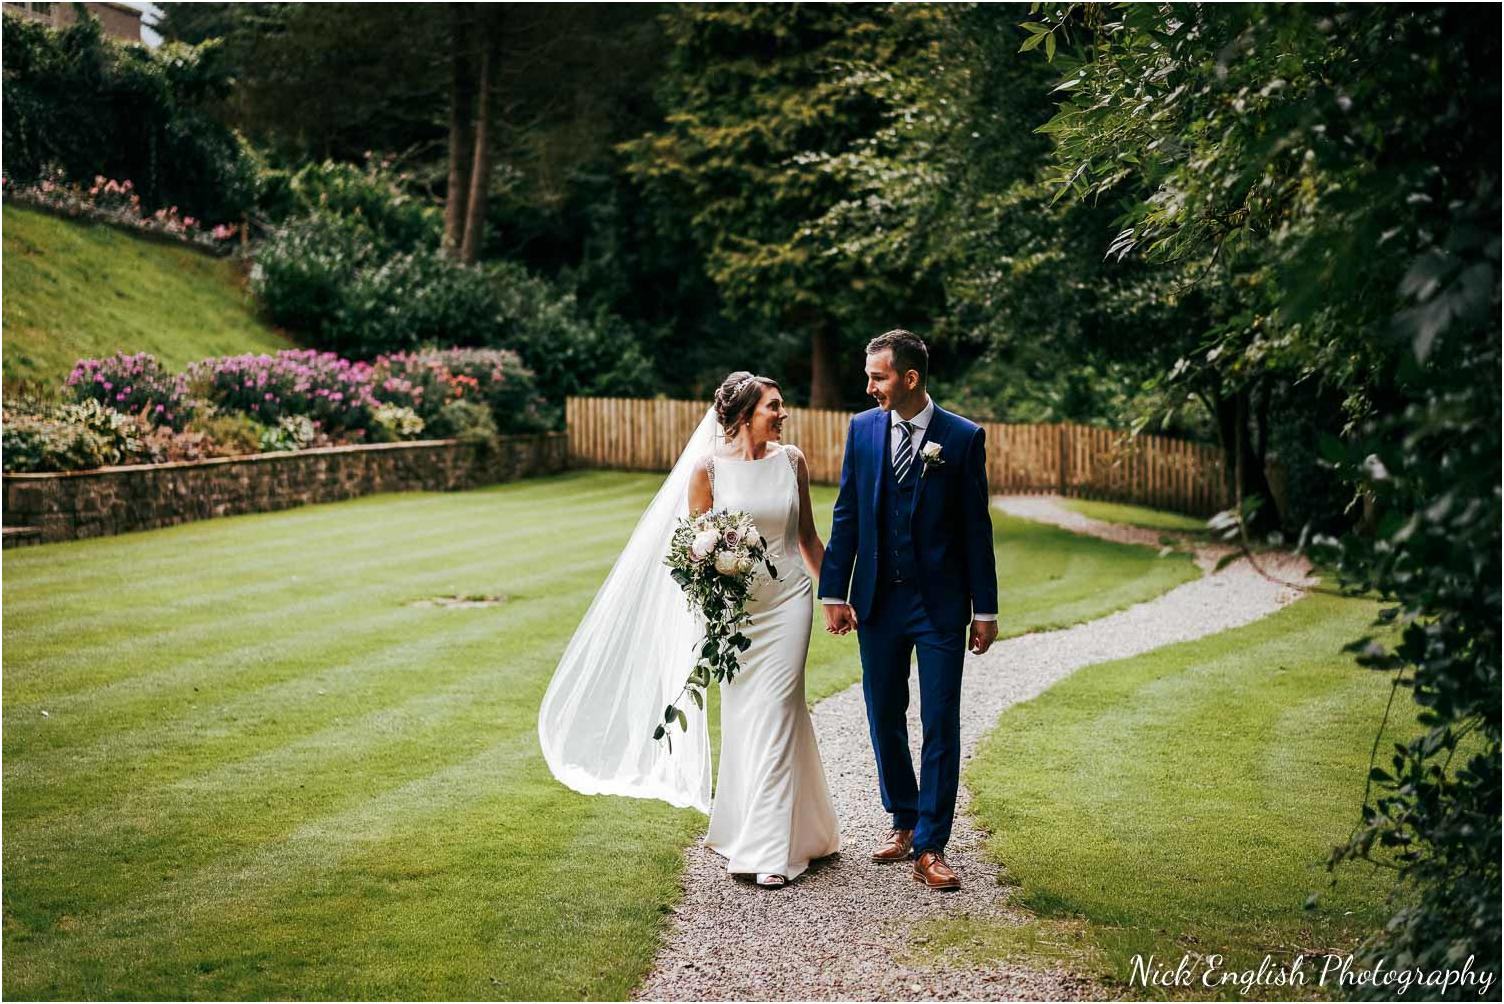 Mitton_Hall_Wedding_Summer_Photograph-78.jpg